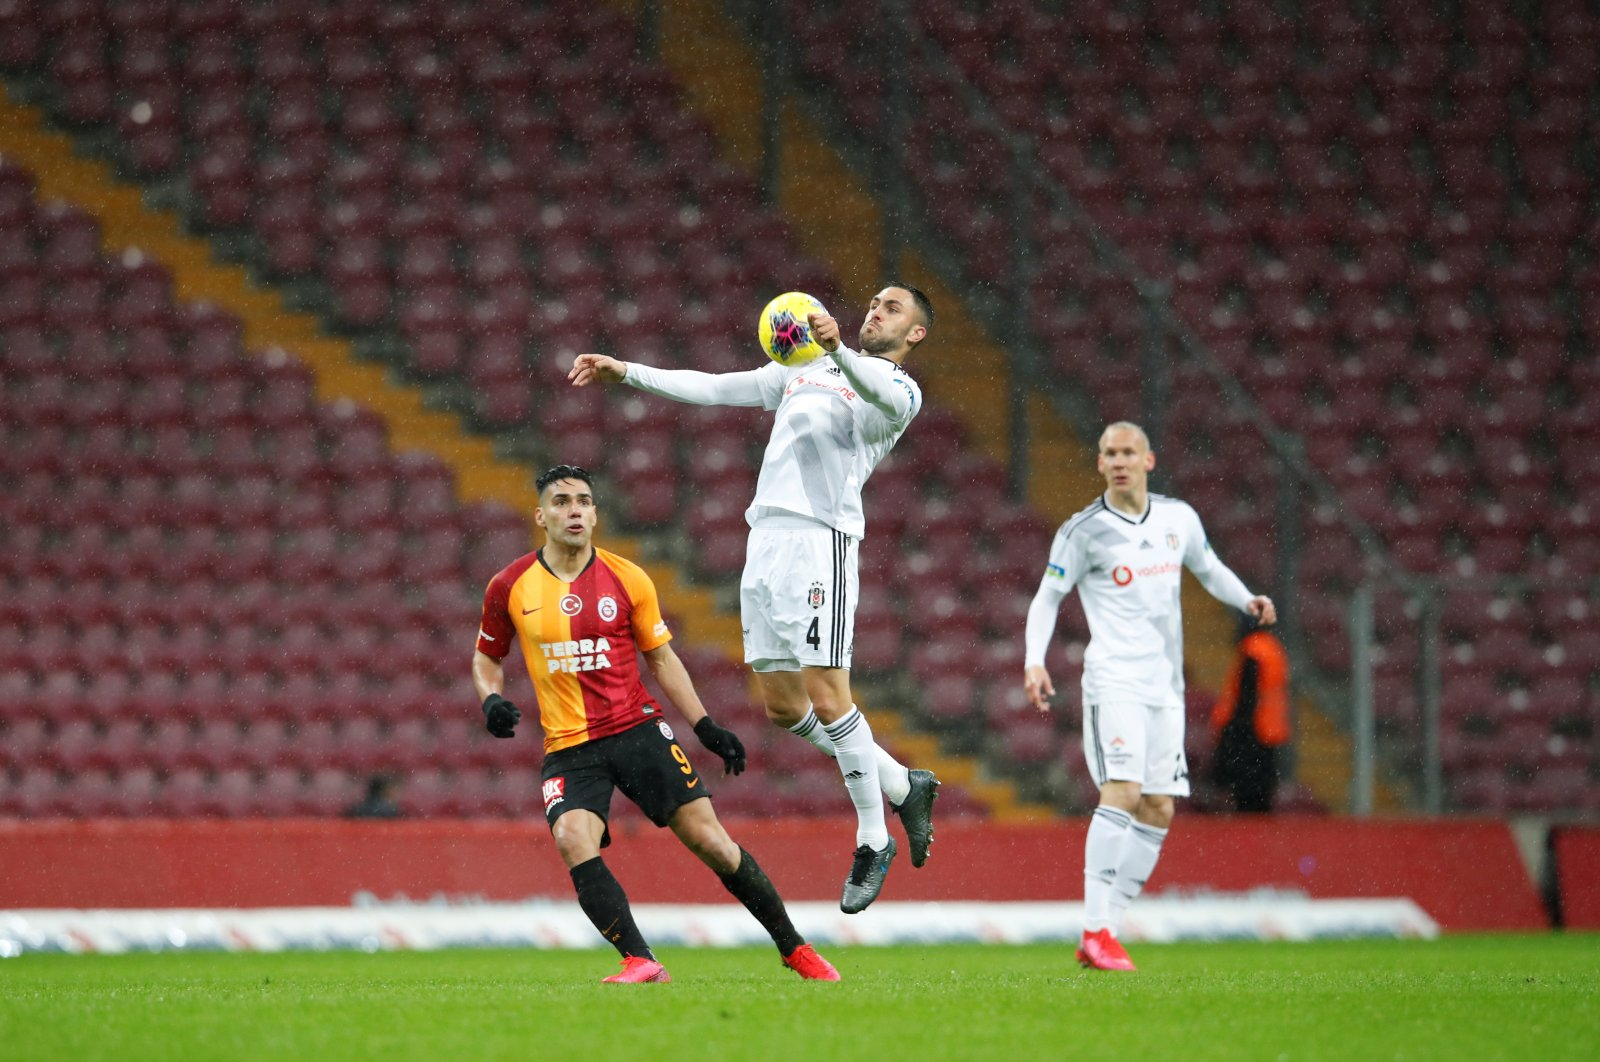 Beşiktaş's Victor Ruiz in action during a Süper Lig match against Galatasaray at Türk Telekom Stadium in Istanbul, Sunday, March 15, 2020. (Reuters Photo)